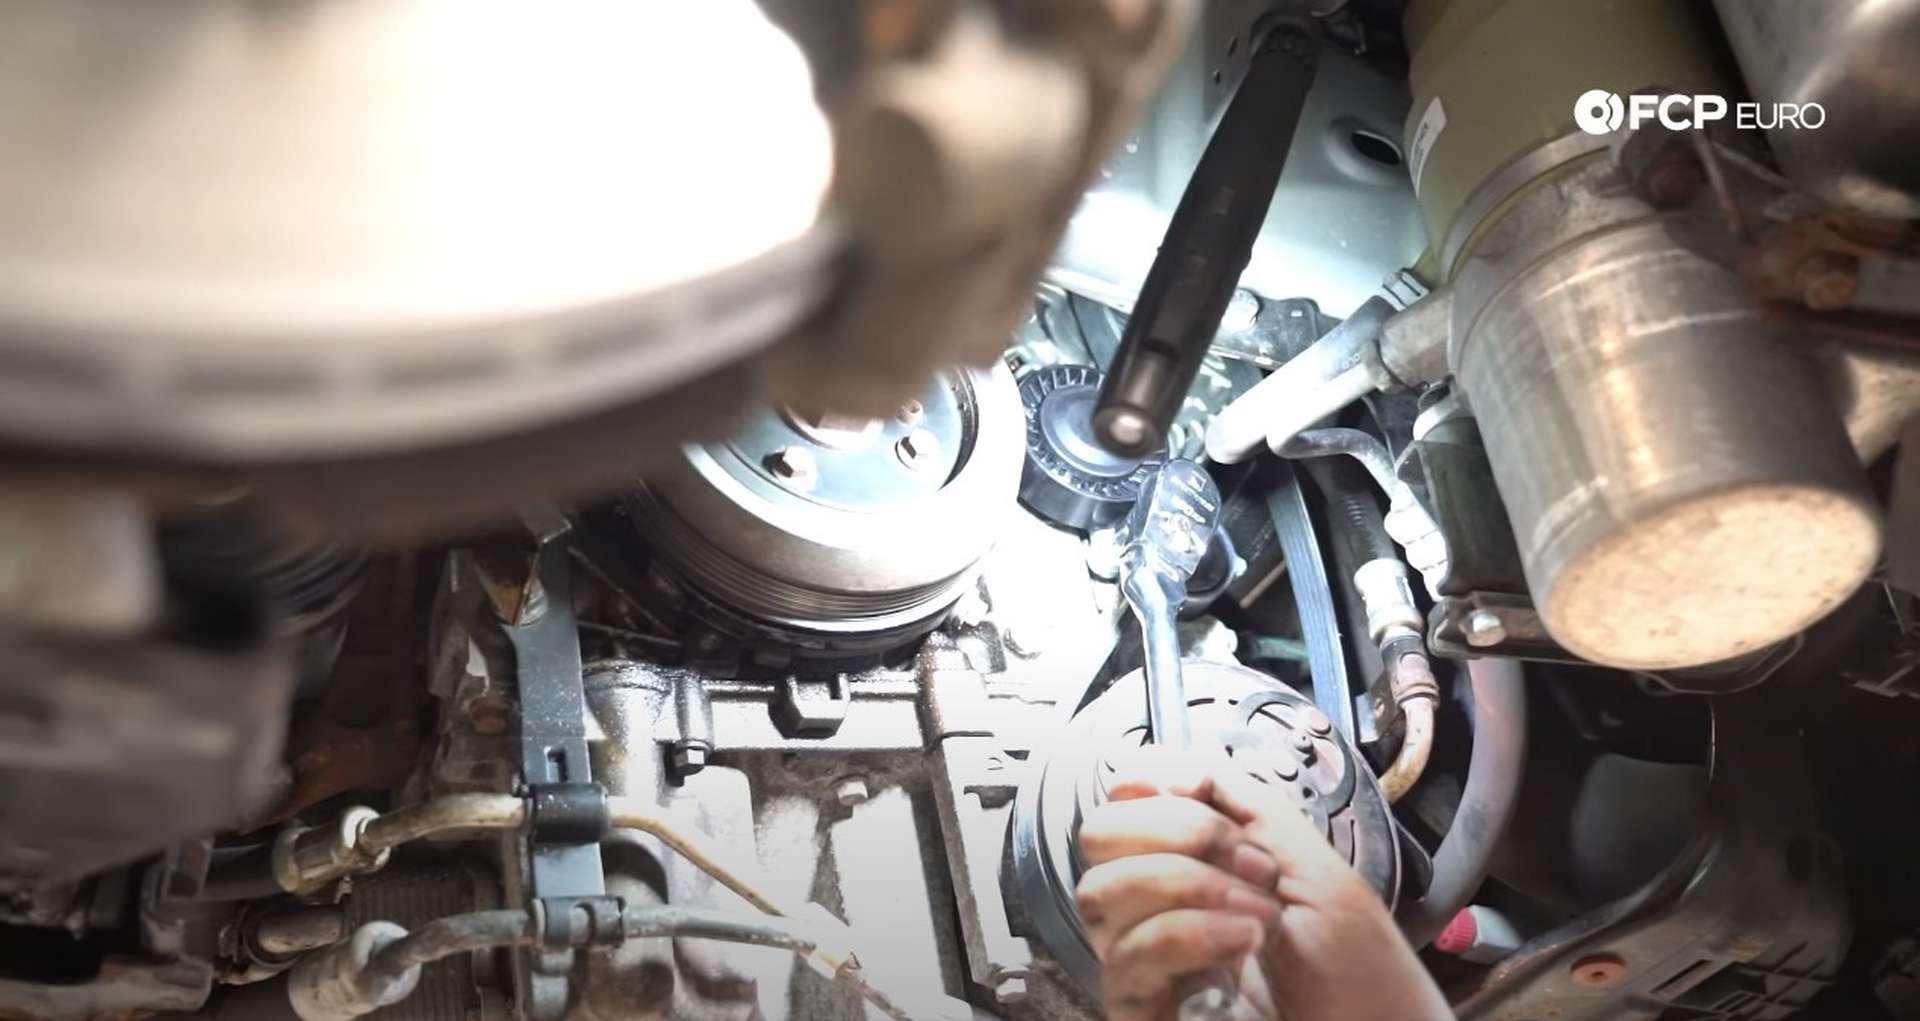 DIY Volvo Alternator and Serpentine Belt Replacement reinstalling the inner belt